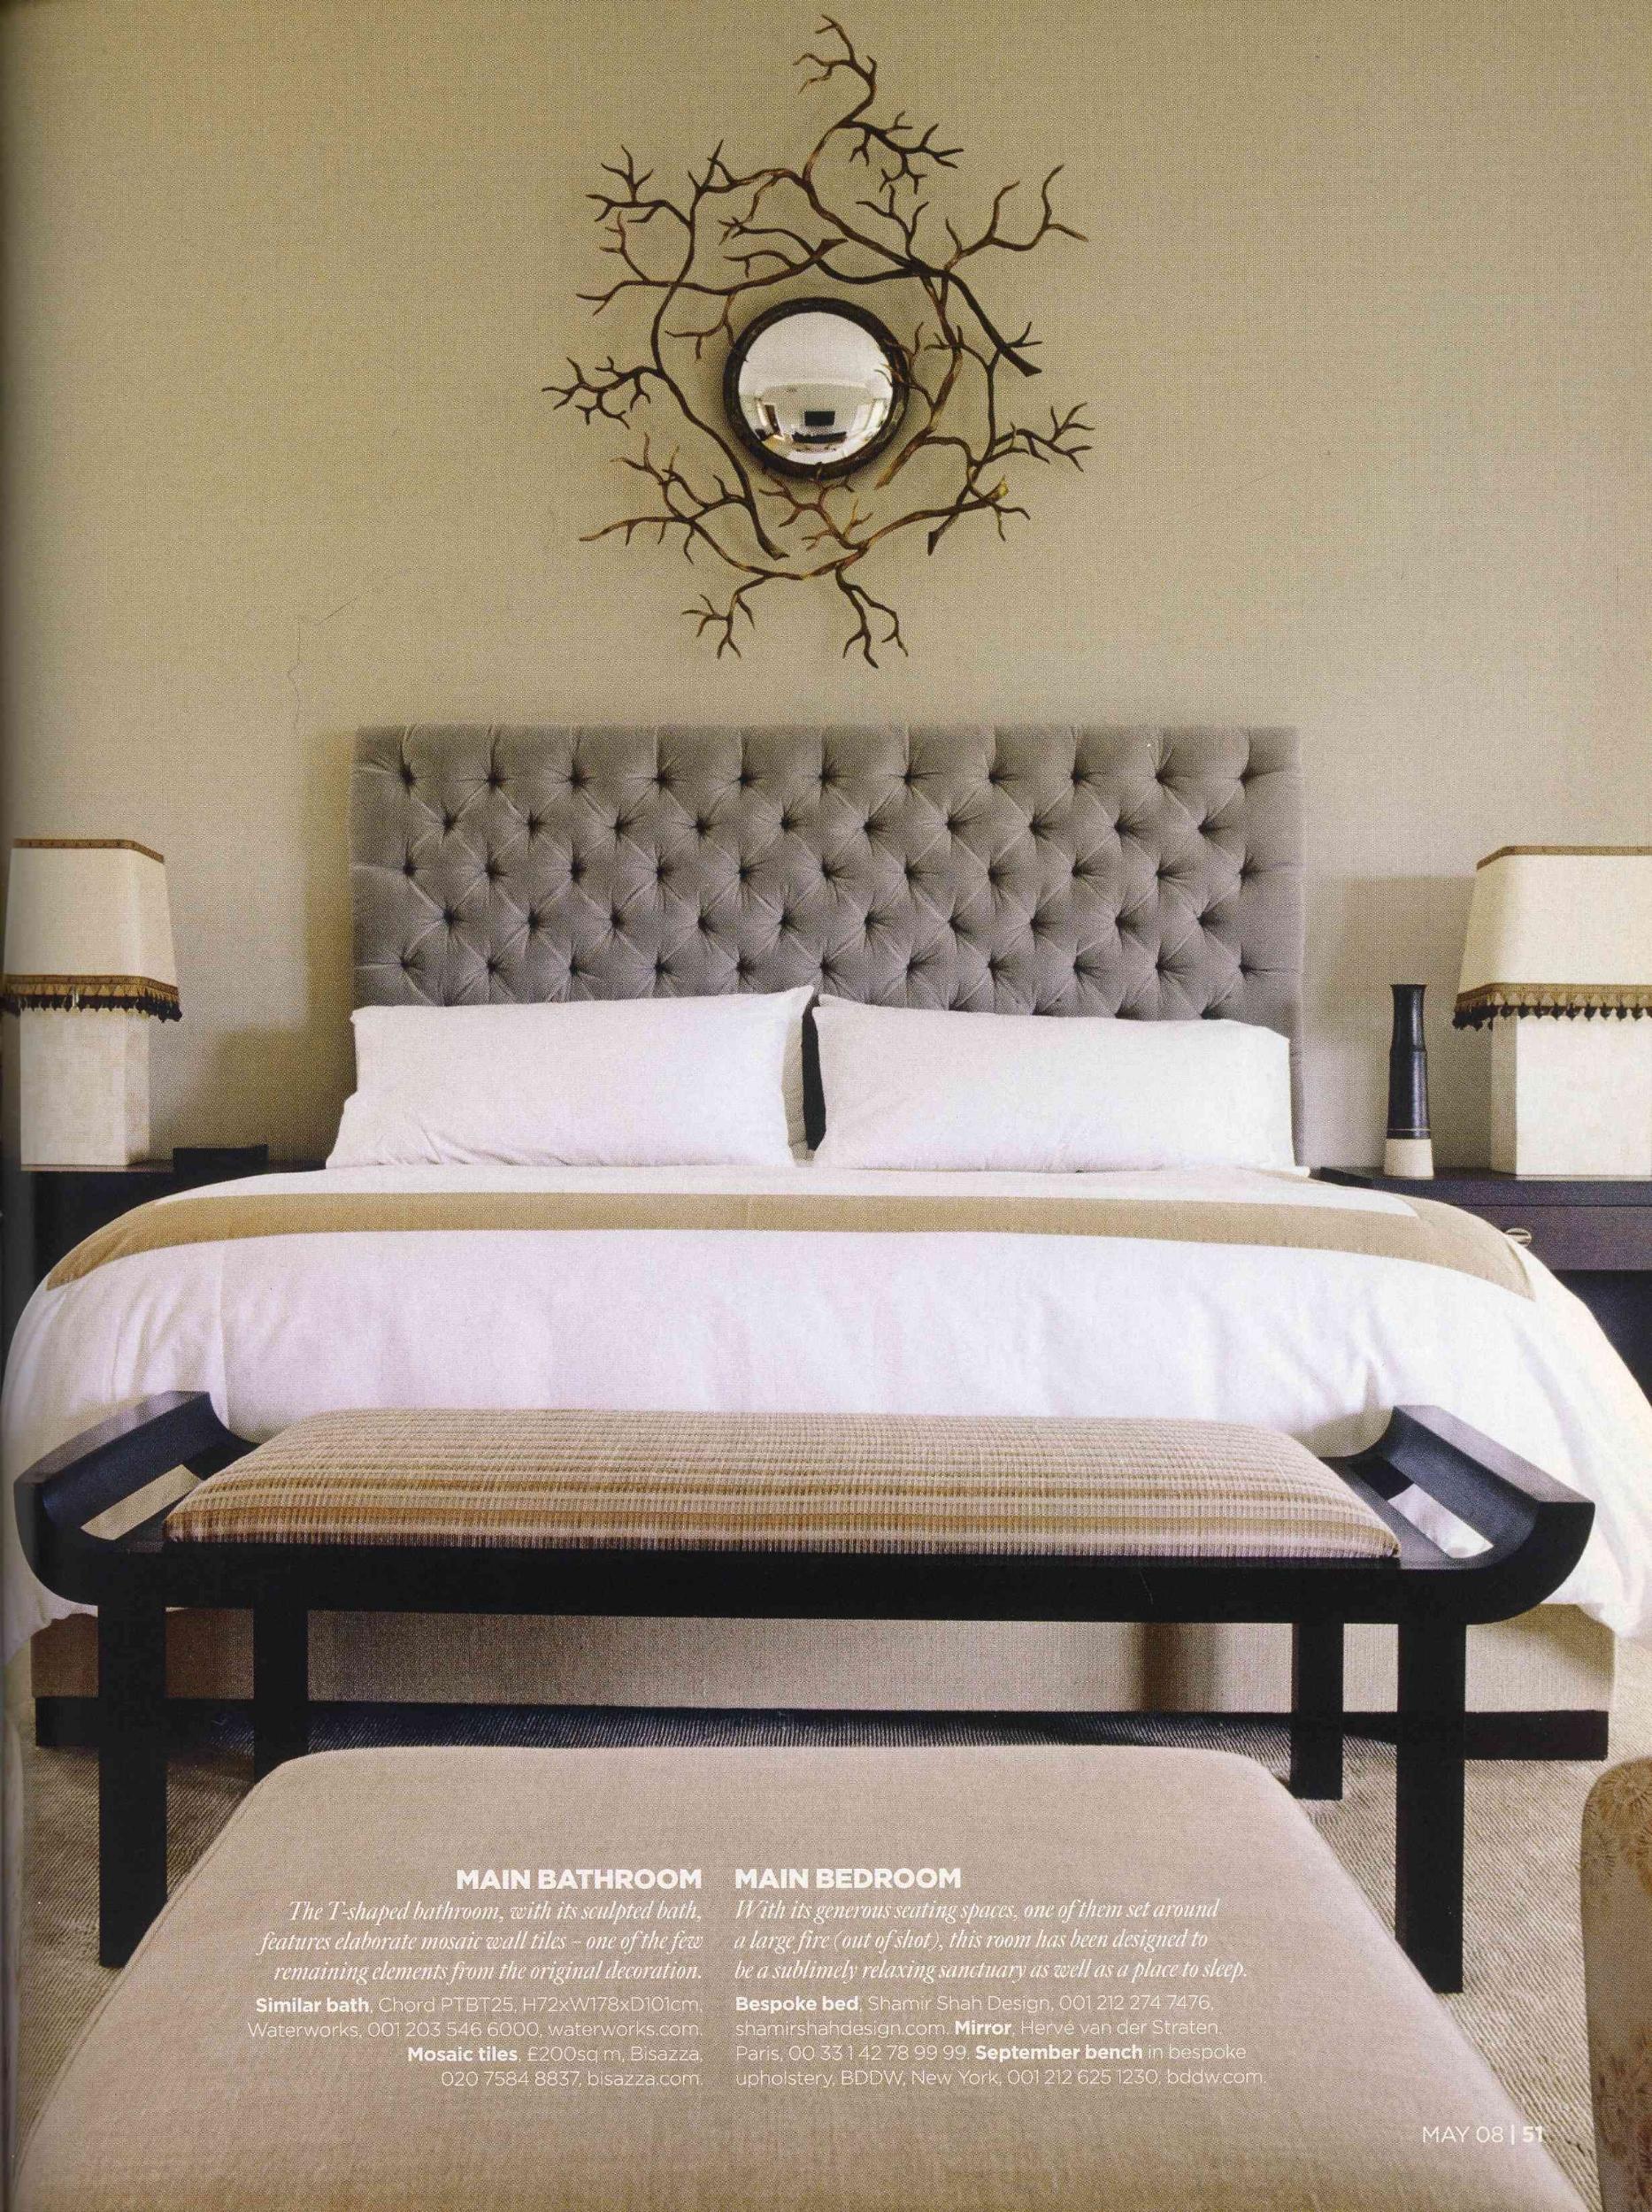 H&G May 08_Menin Hamptons_Full Article_Page_09.jpg